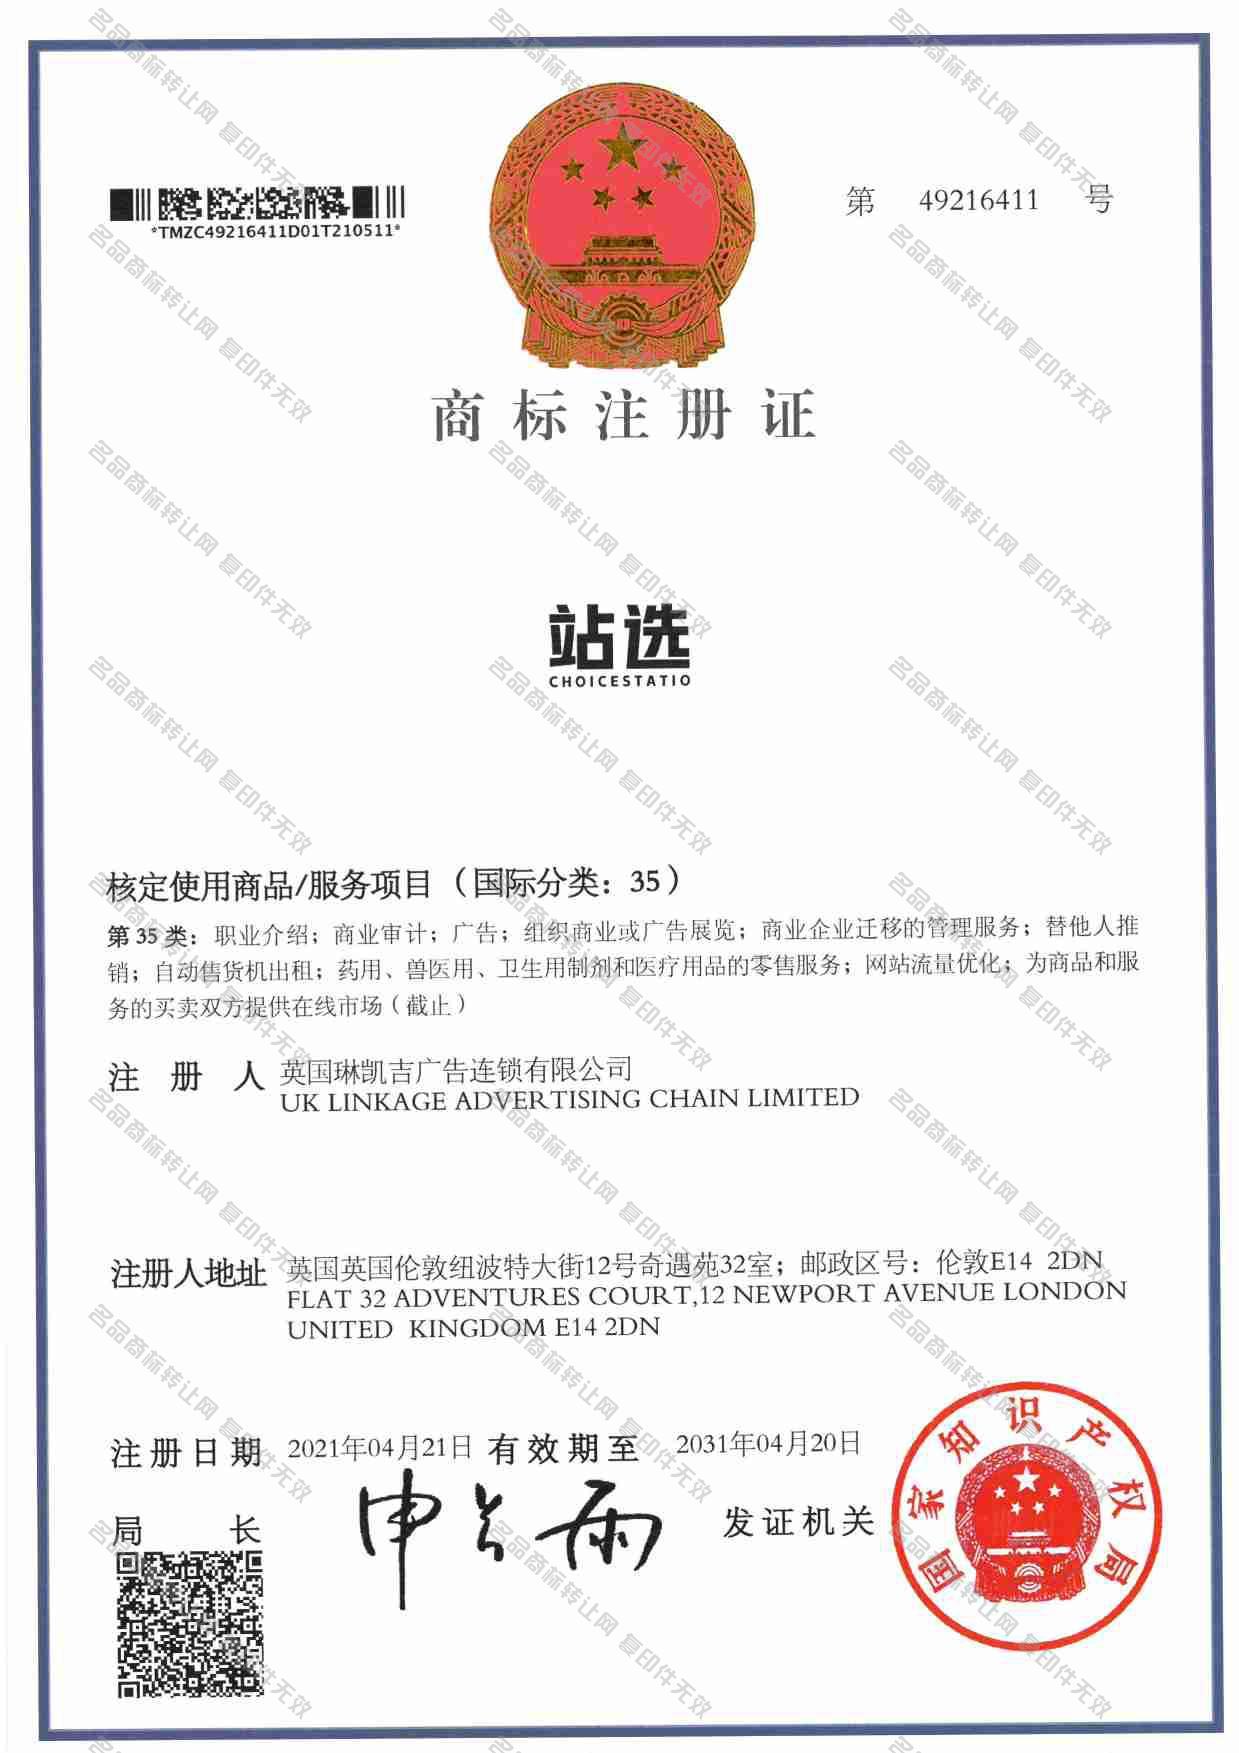 站选 CHOICE STATIO注册证